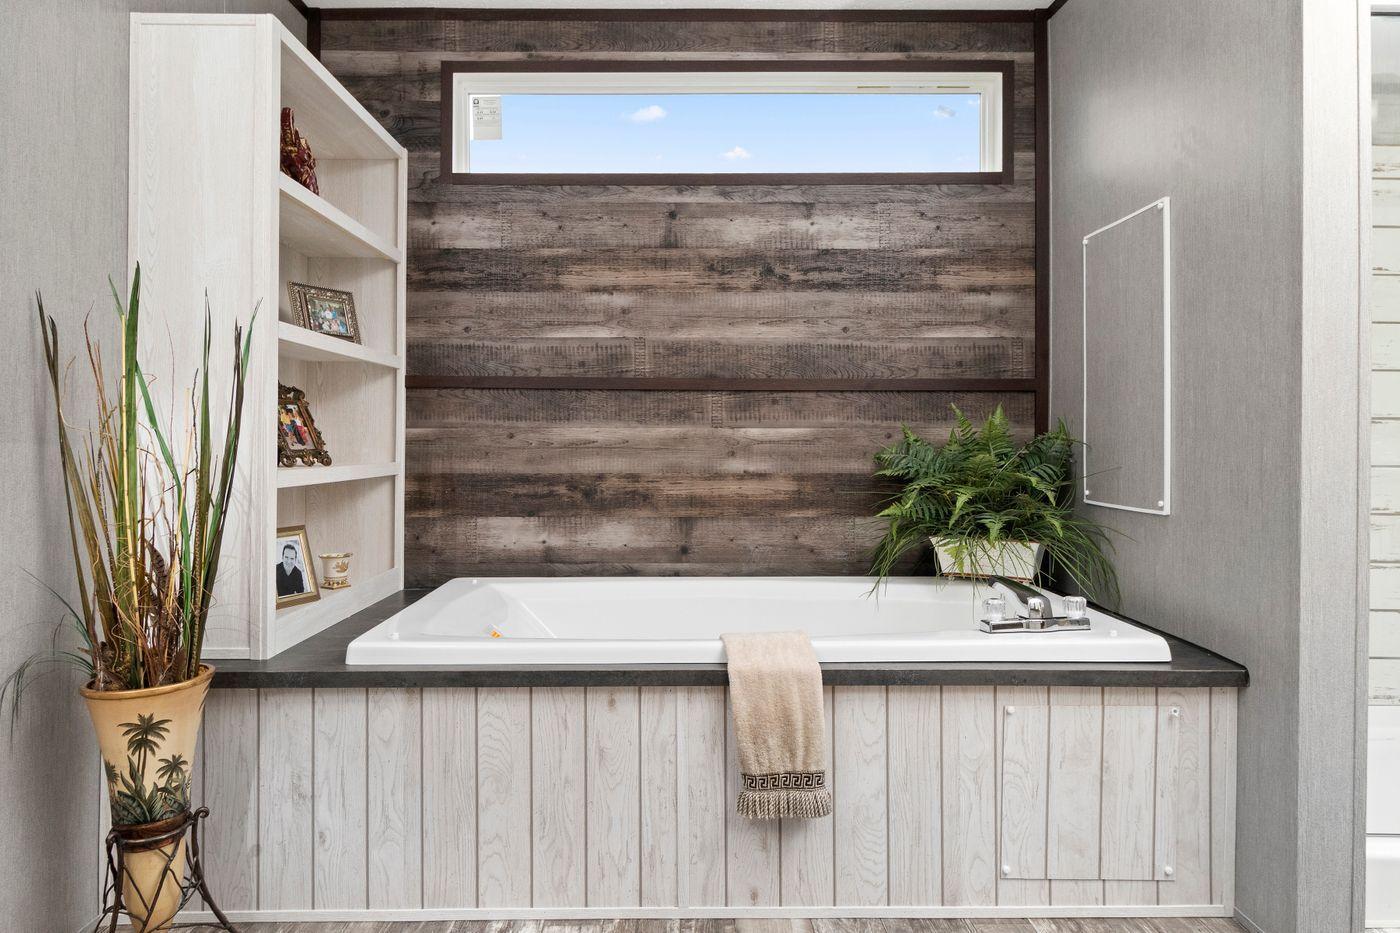 The Seaside Bathroom